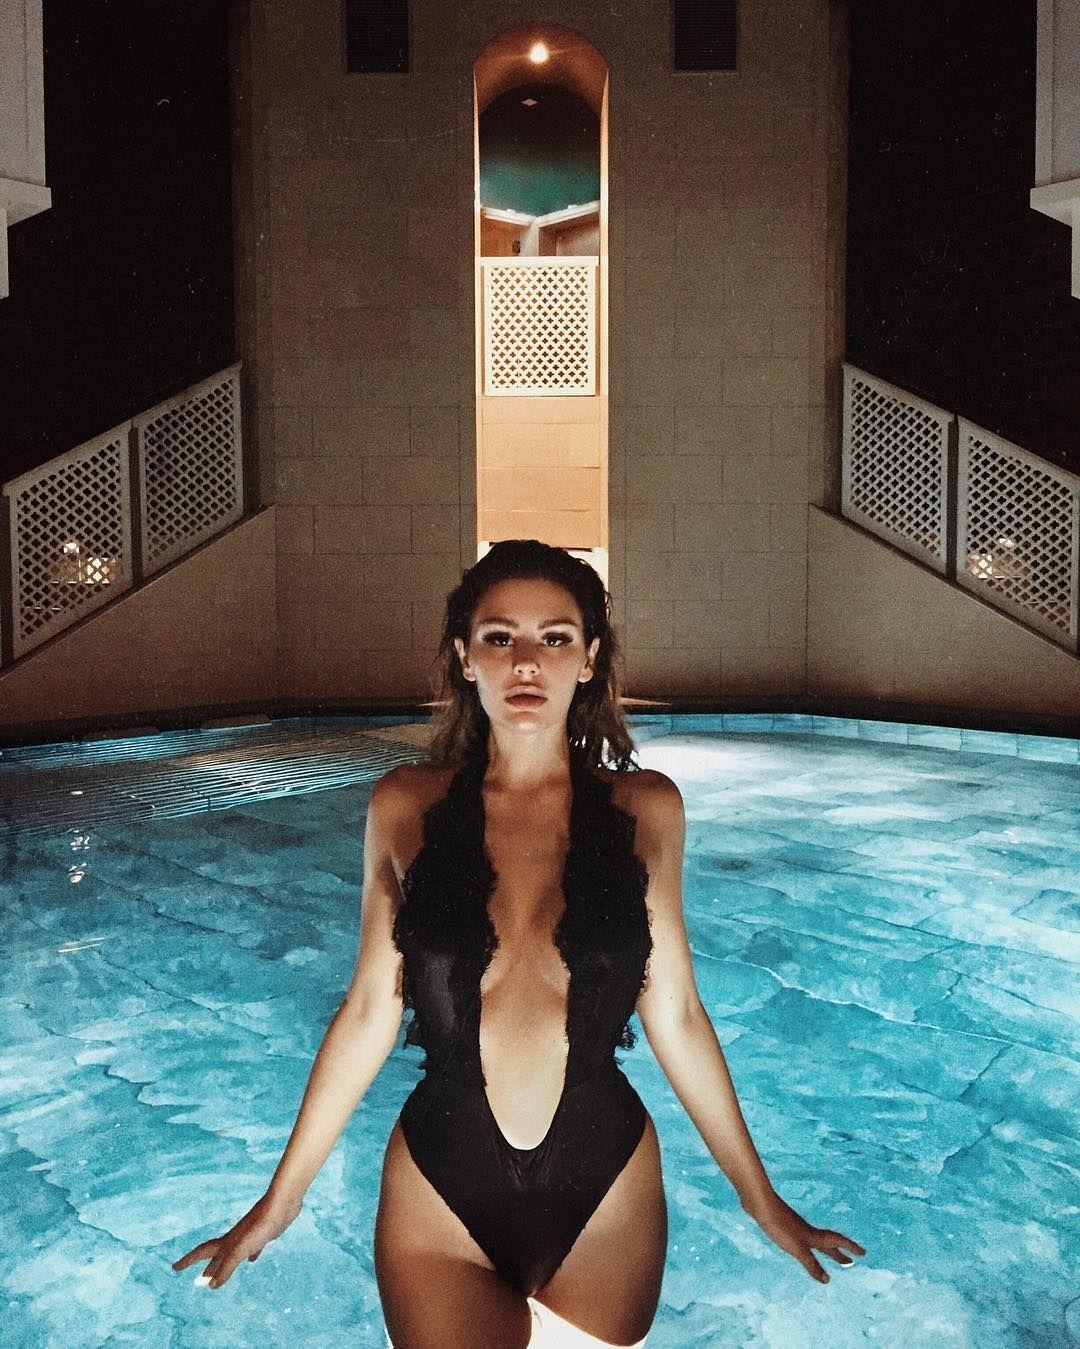 Bikini Nima Benati naked (18 photos), Pussy, Fappening, Selfie, bra 2018